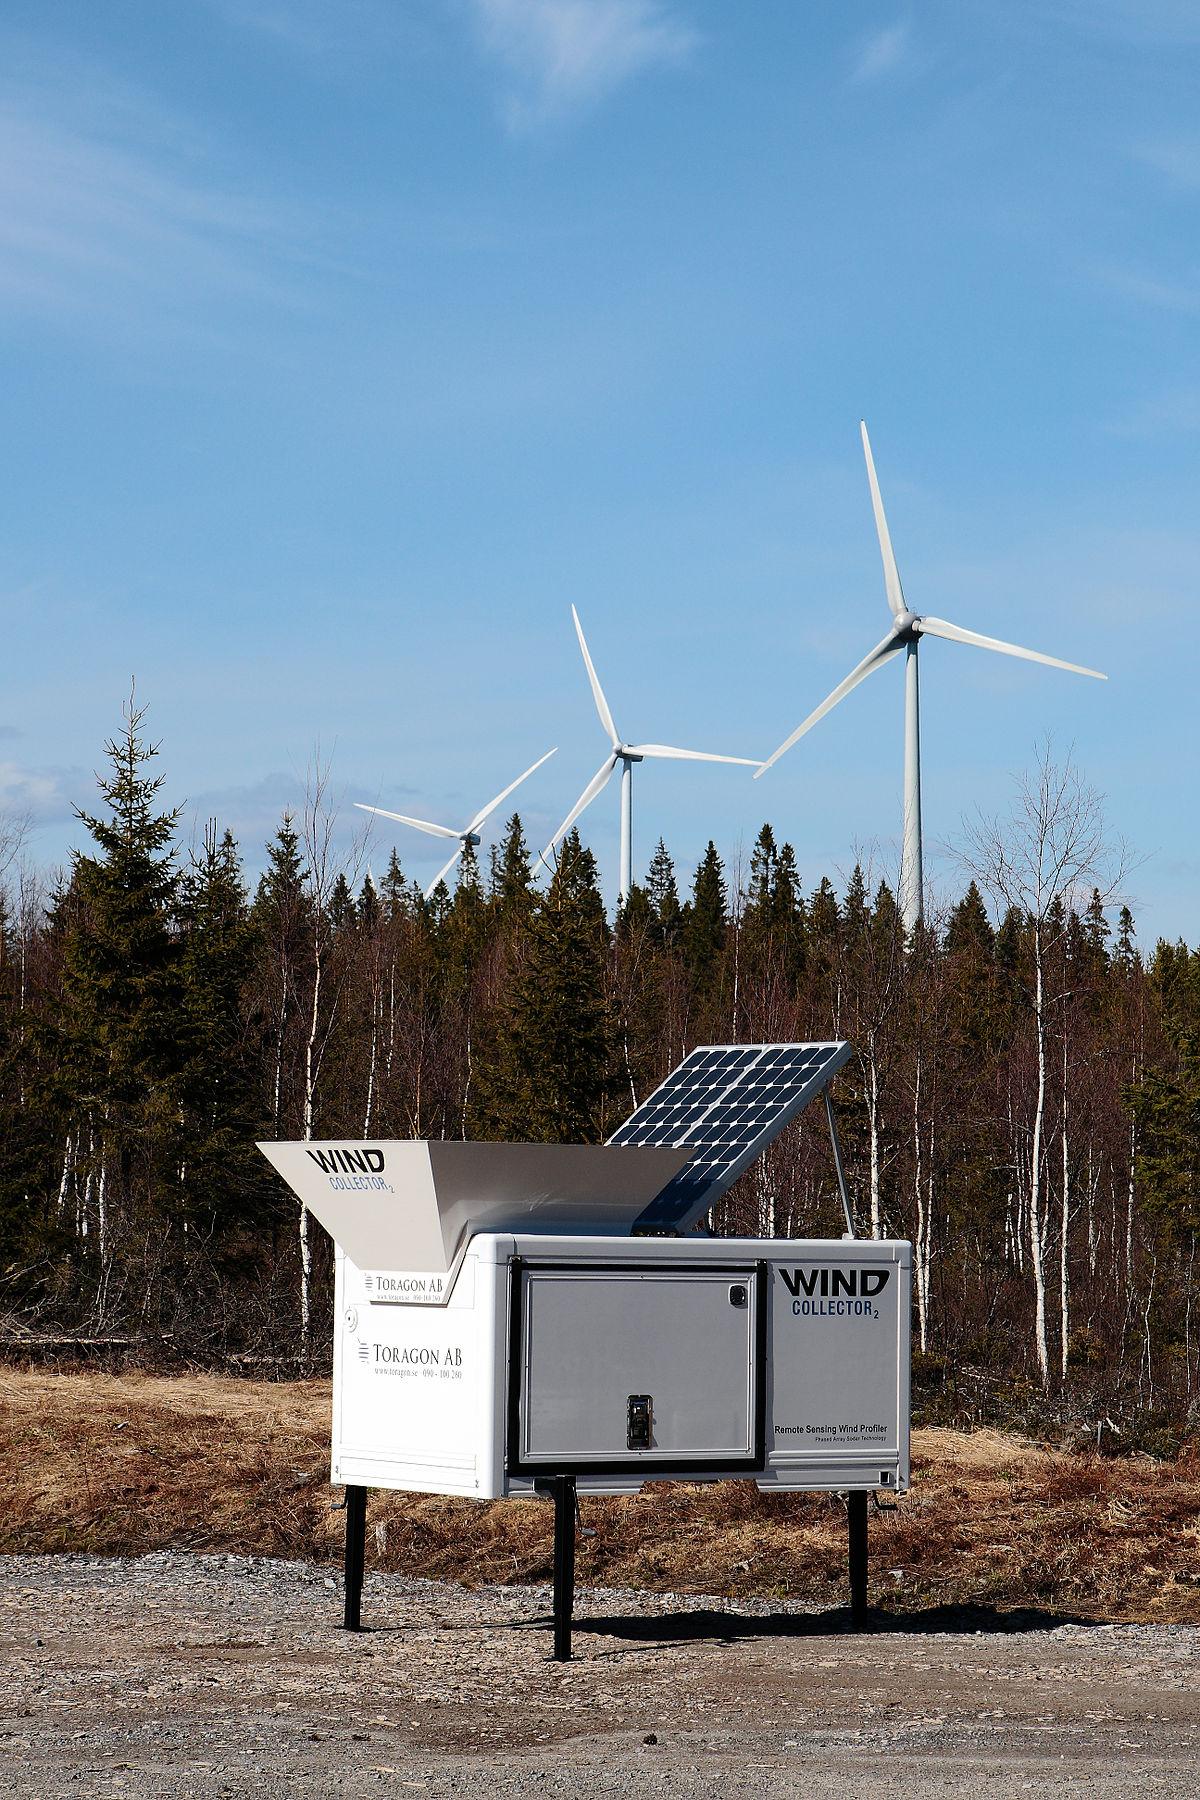 Wind profiler - Wikipedia